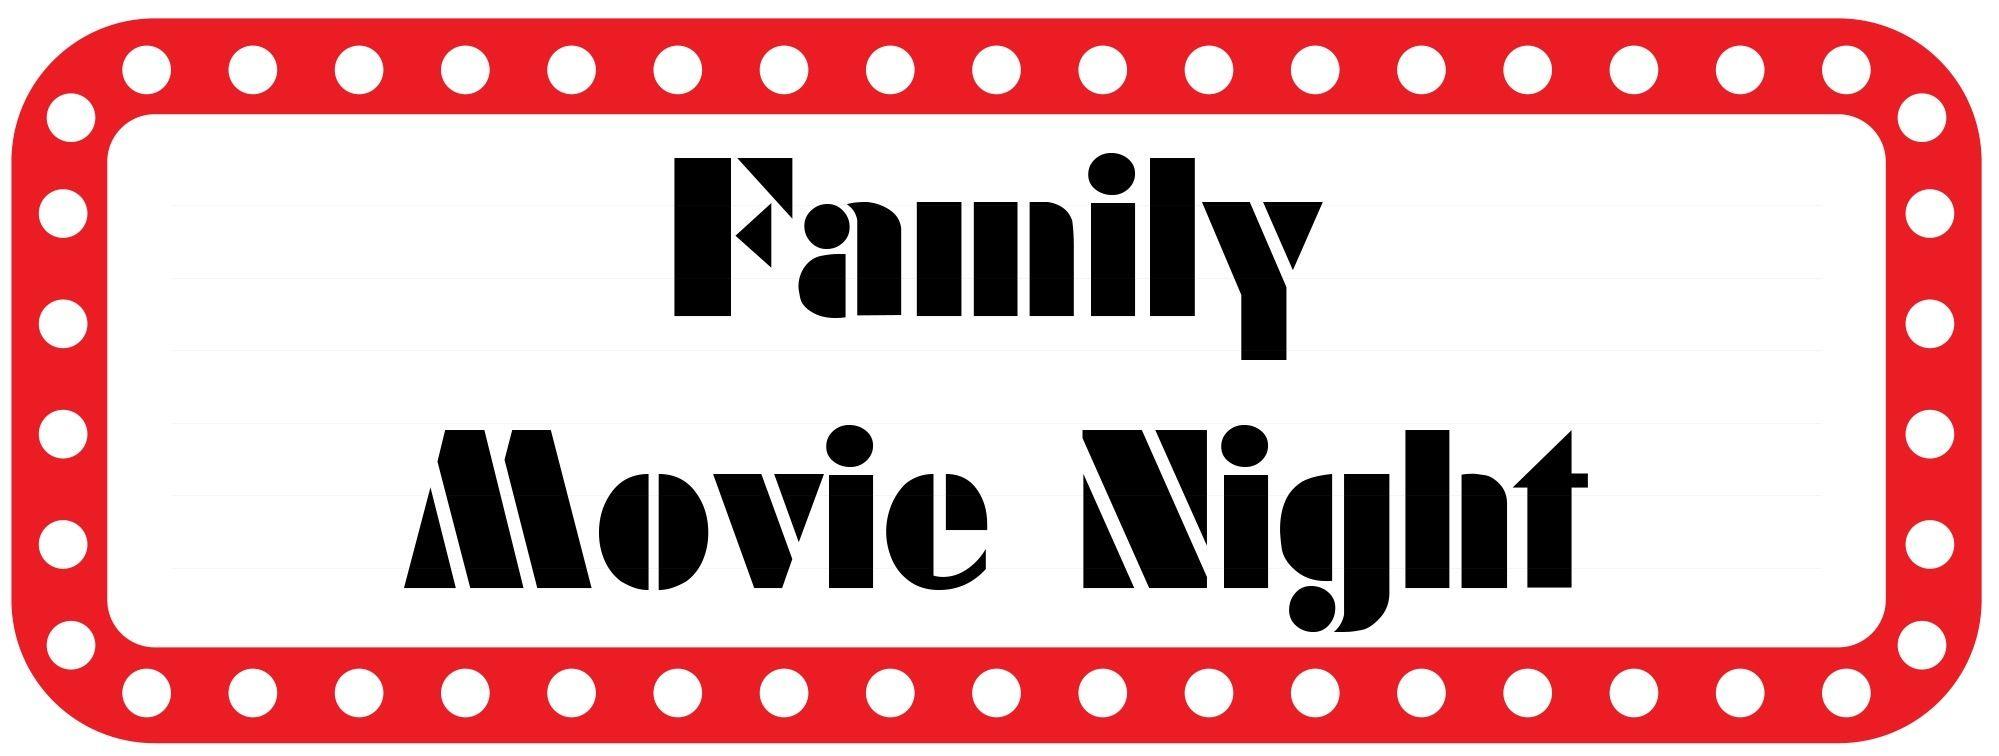 Family movie night pto clip art pinterest